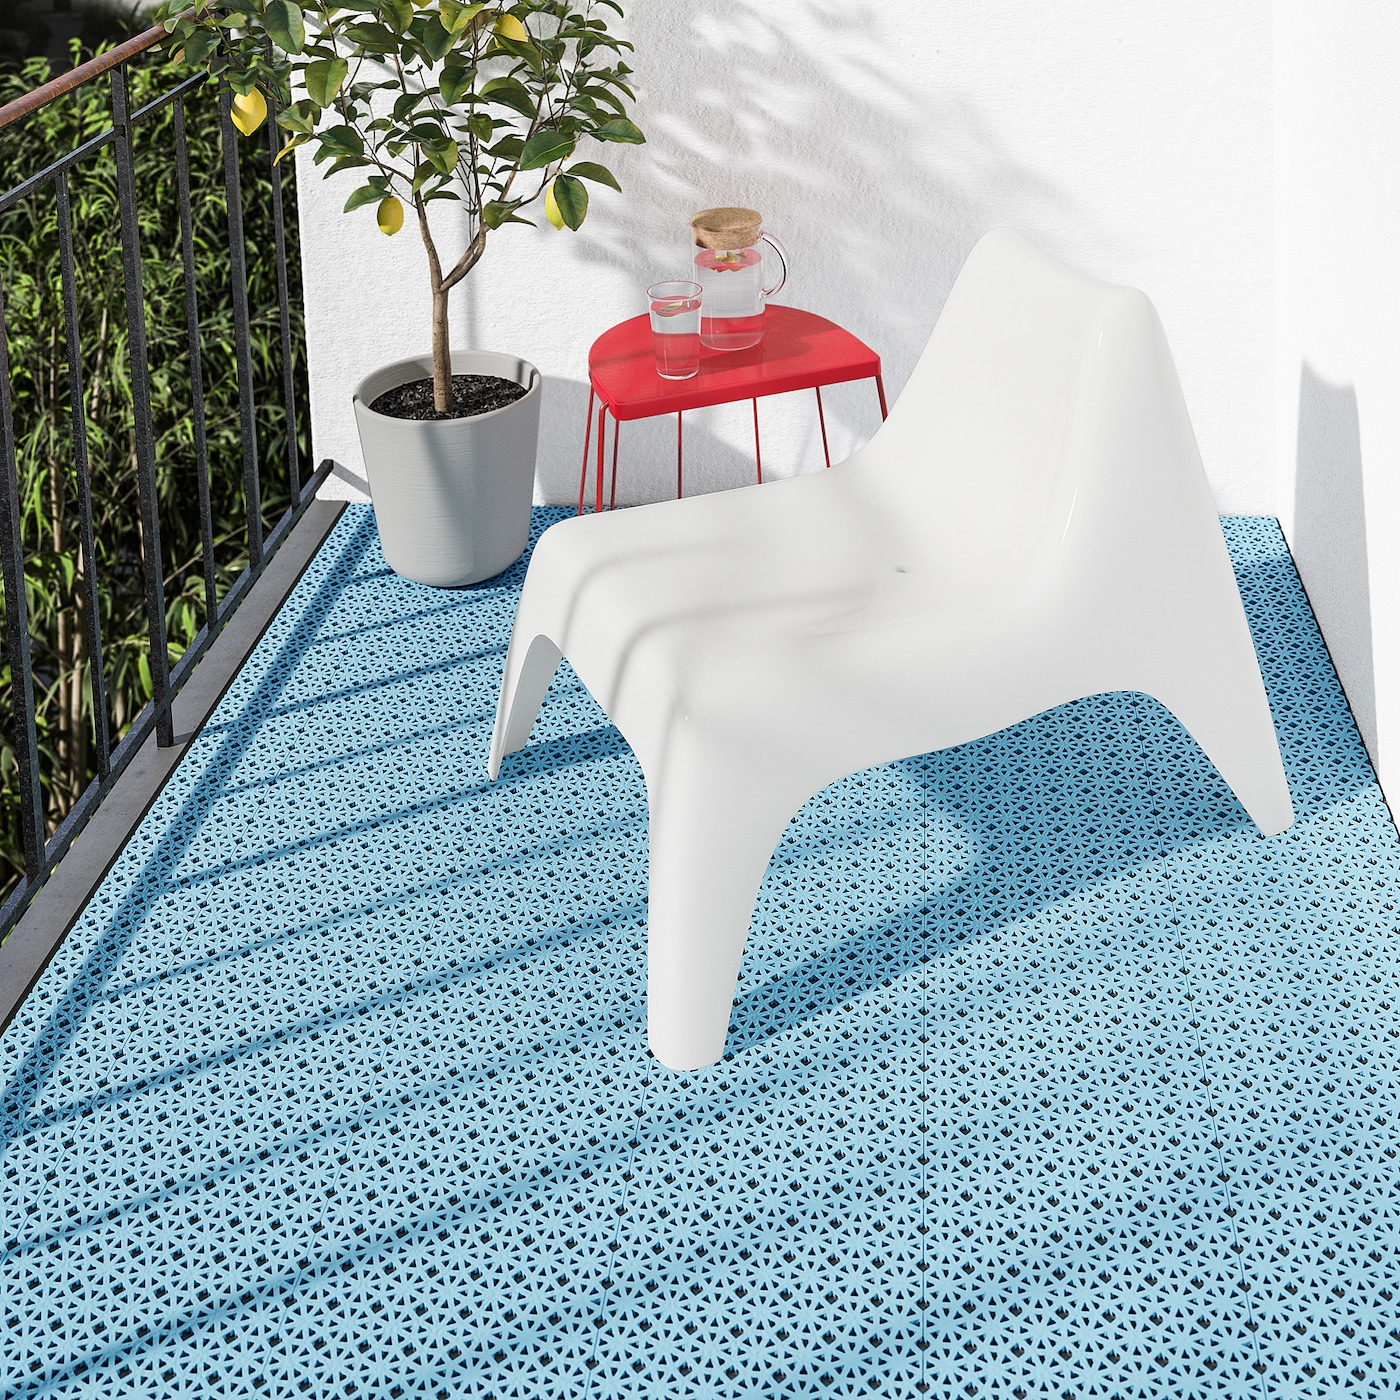 ALTAPPEN Floor decking, outdoor - light blue - IKEA